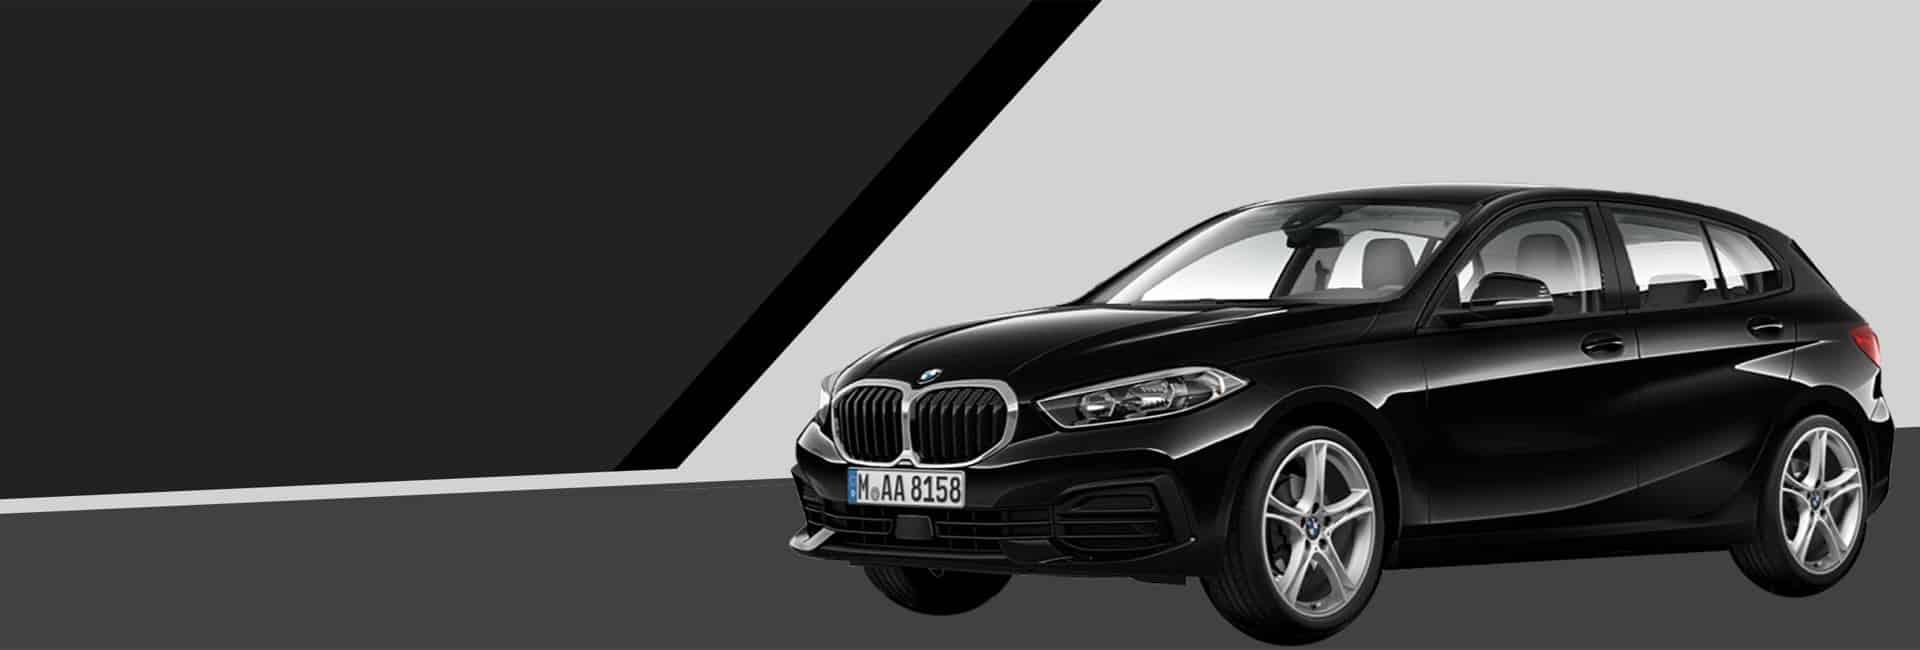 1er BMW Leasingangebot